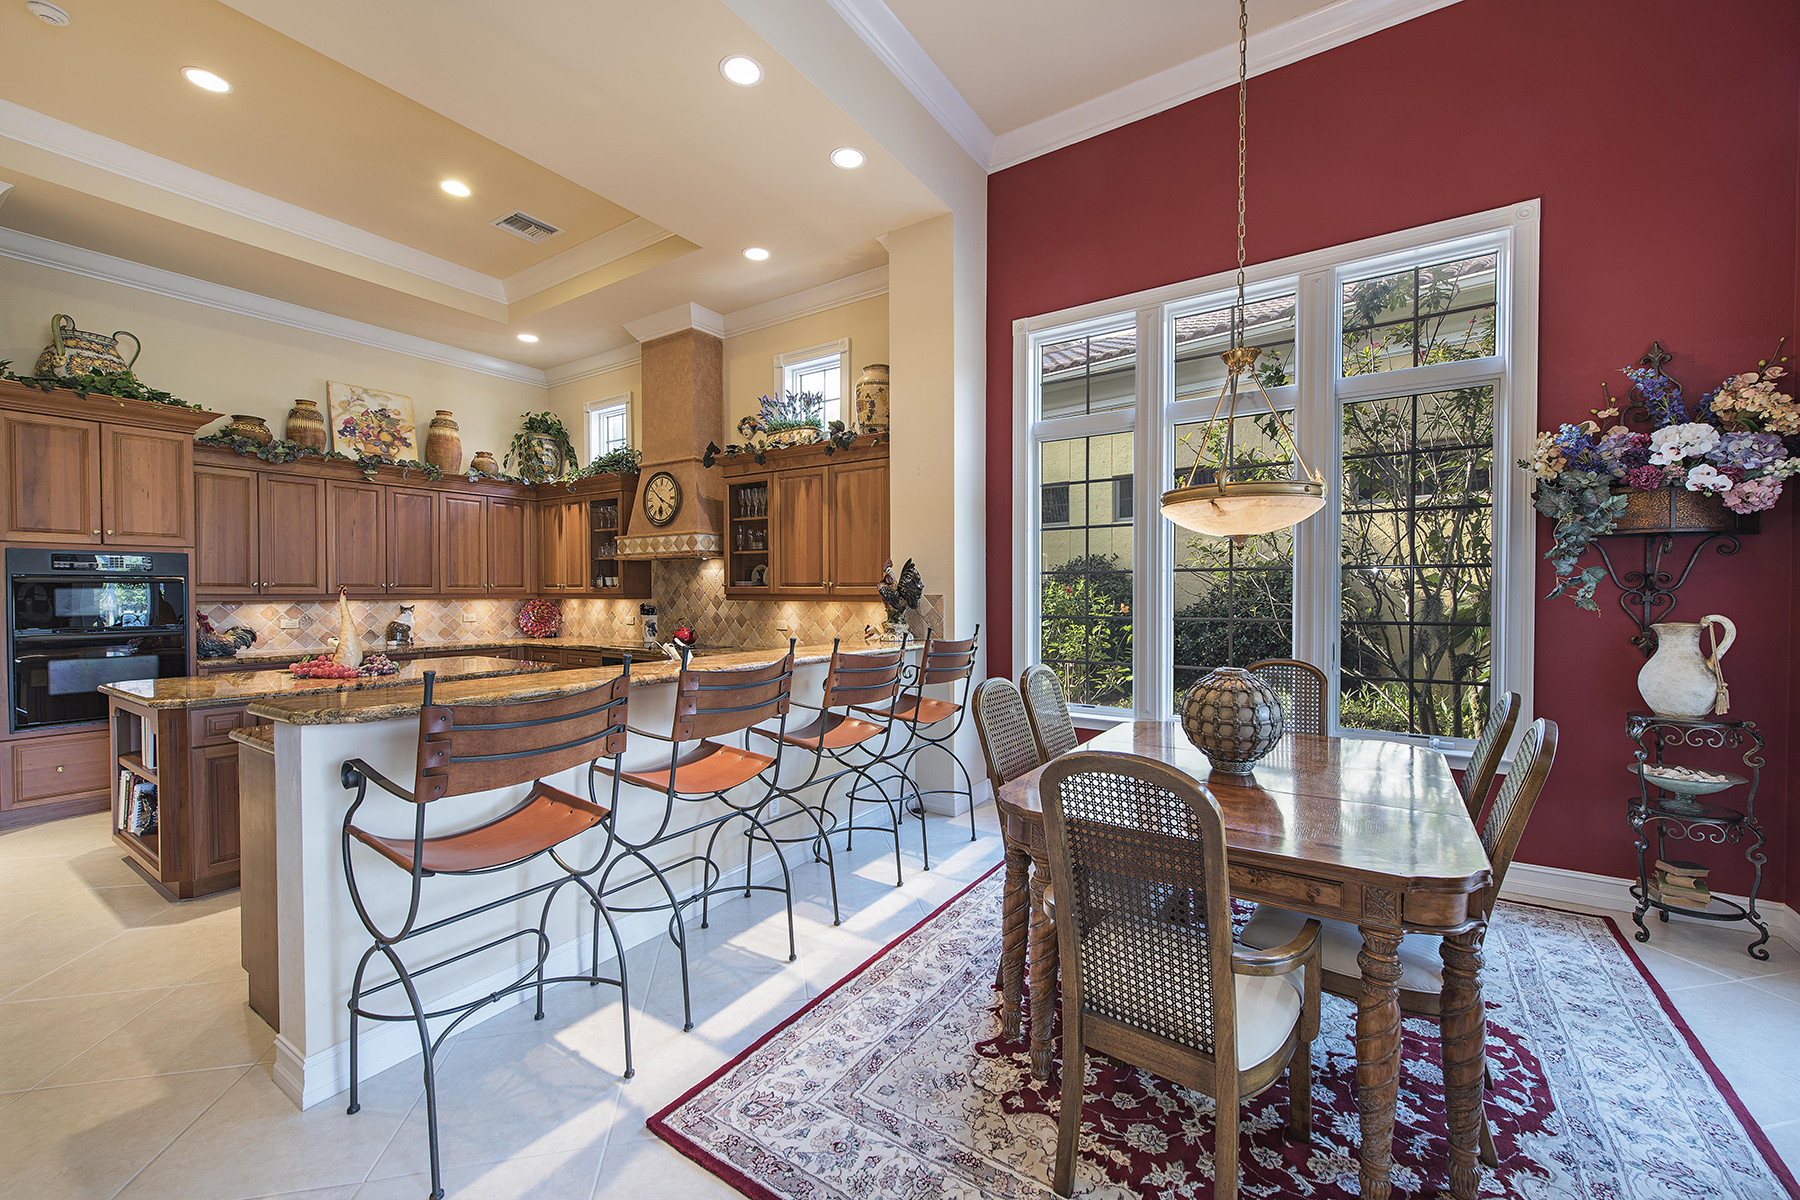 Single Family Home for Sale at TERRABELLA IN PELICAN MARSH 9024 Terranova Dr Naples, Florida 34109 United States